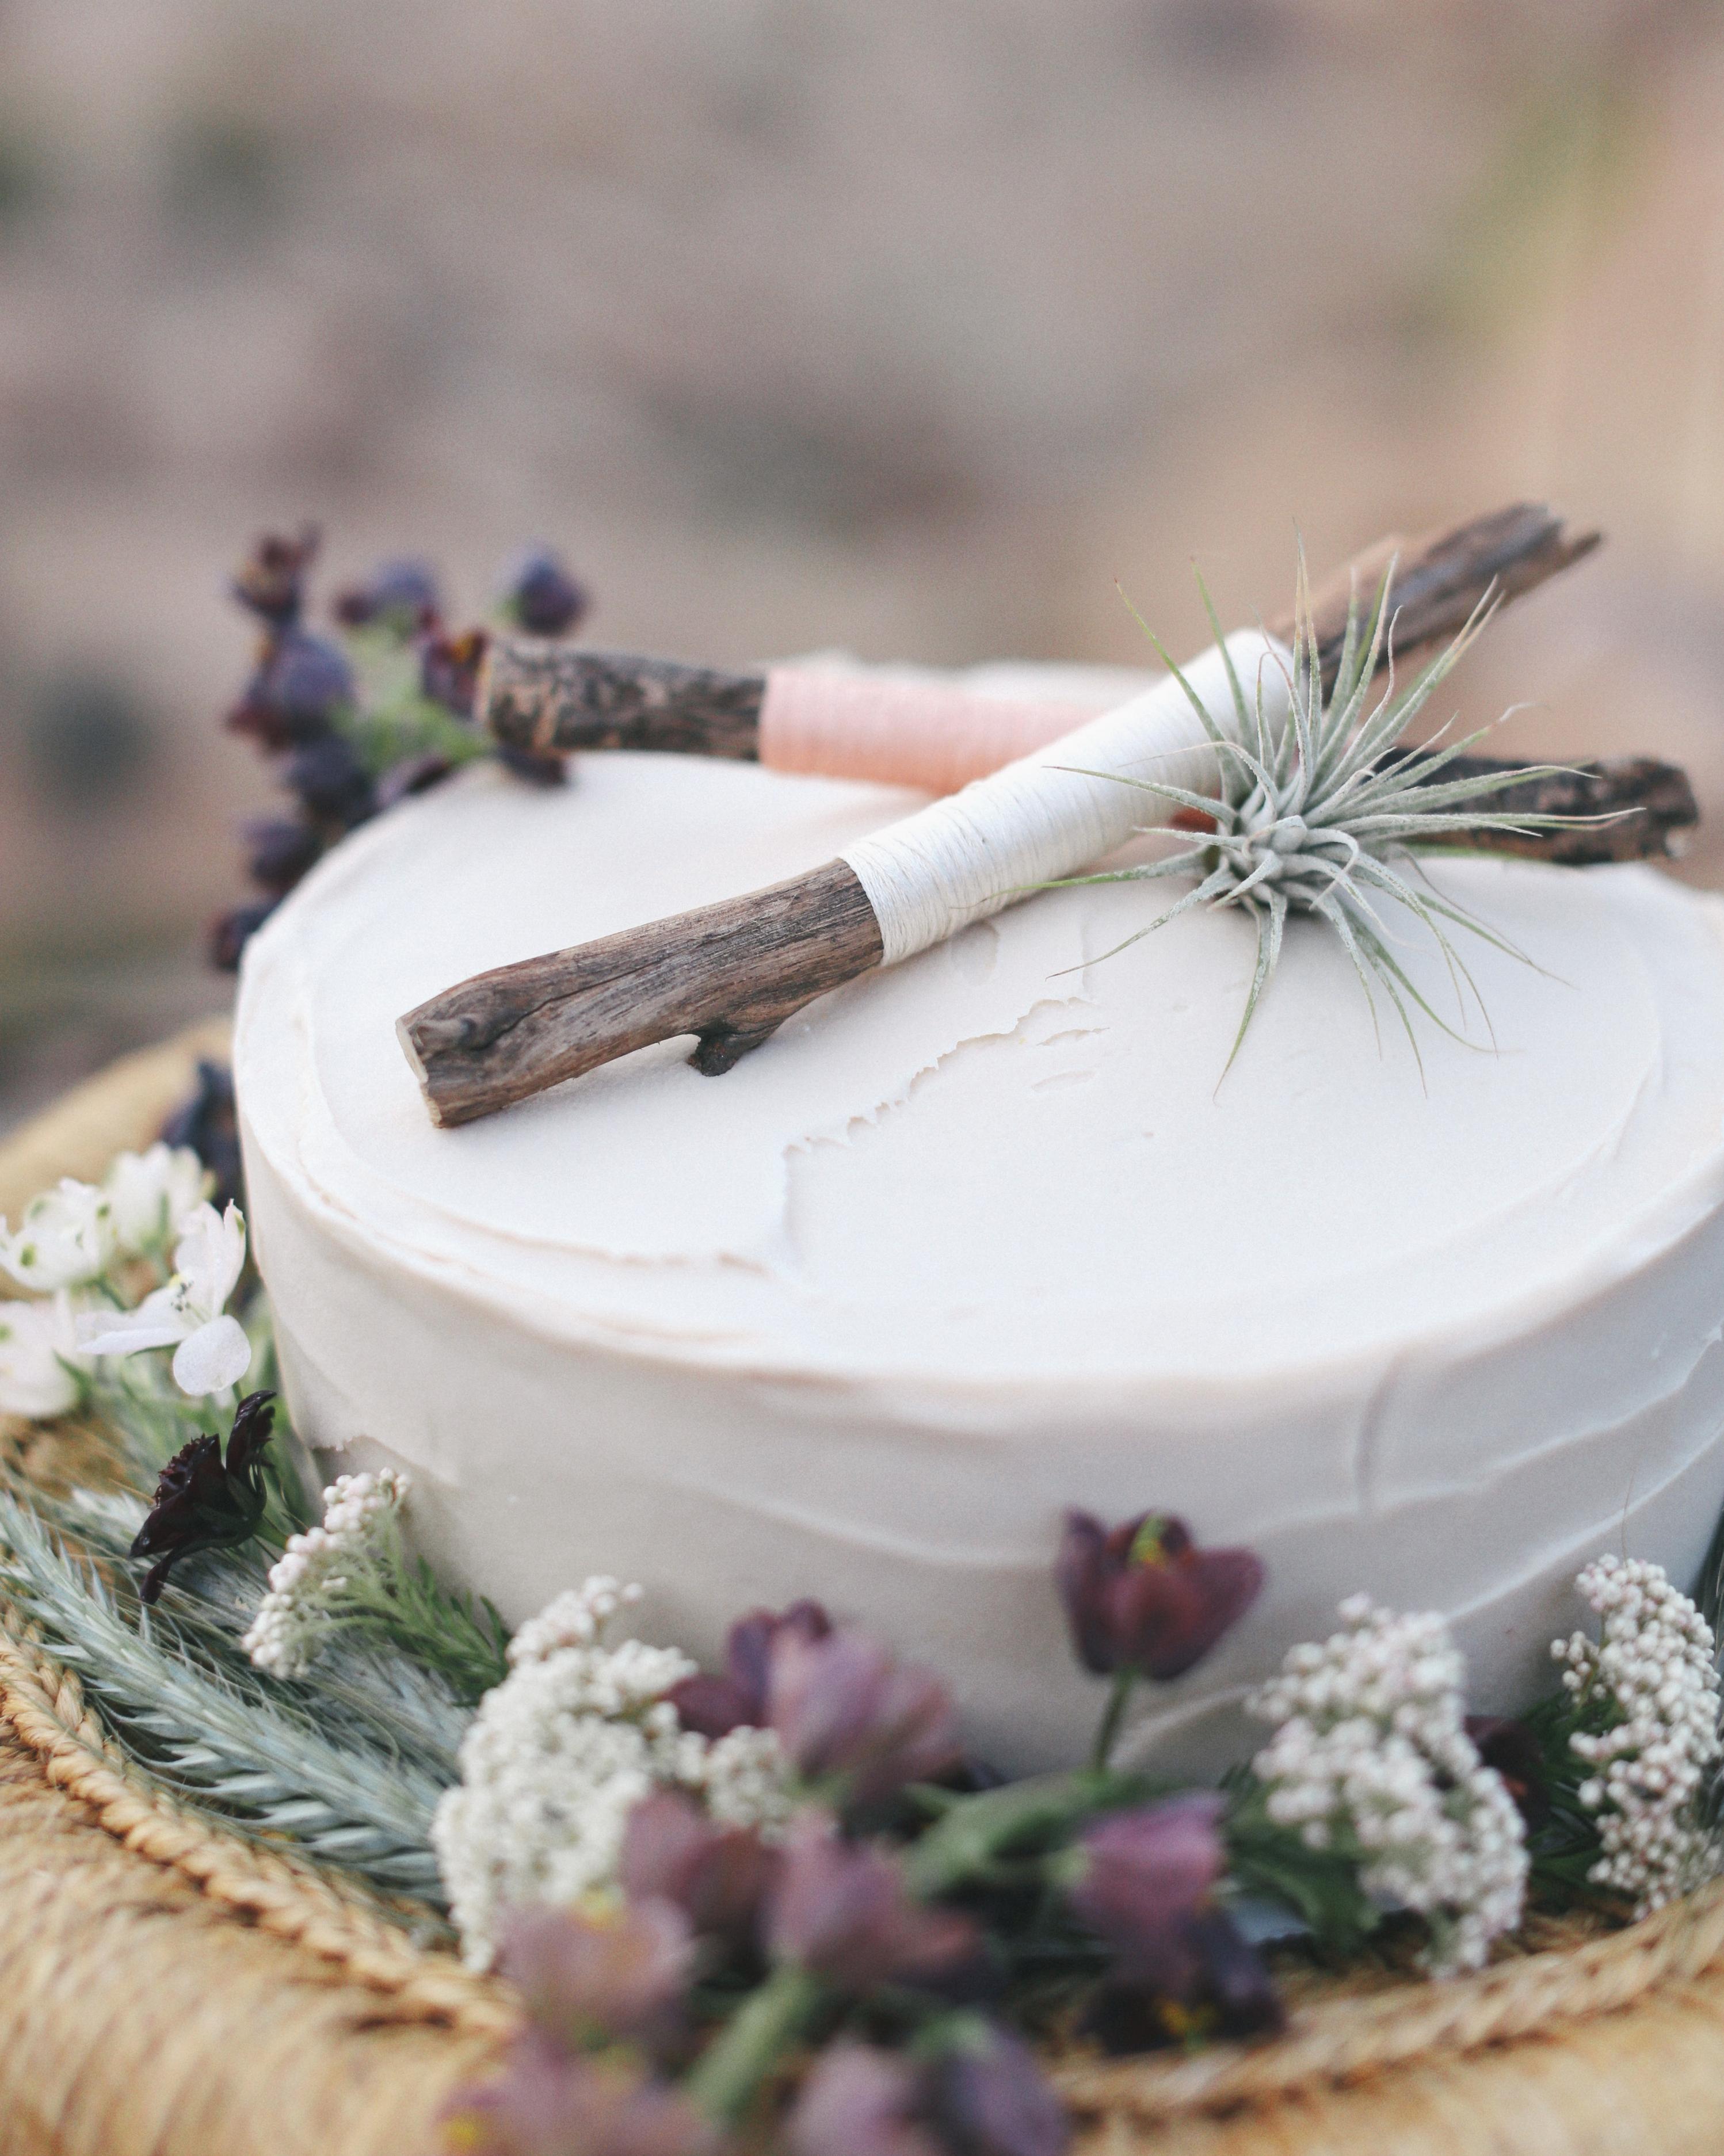 christen-billy-wedding-cake-161-011-s111597-1014.jpg